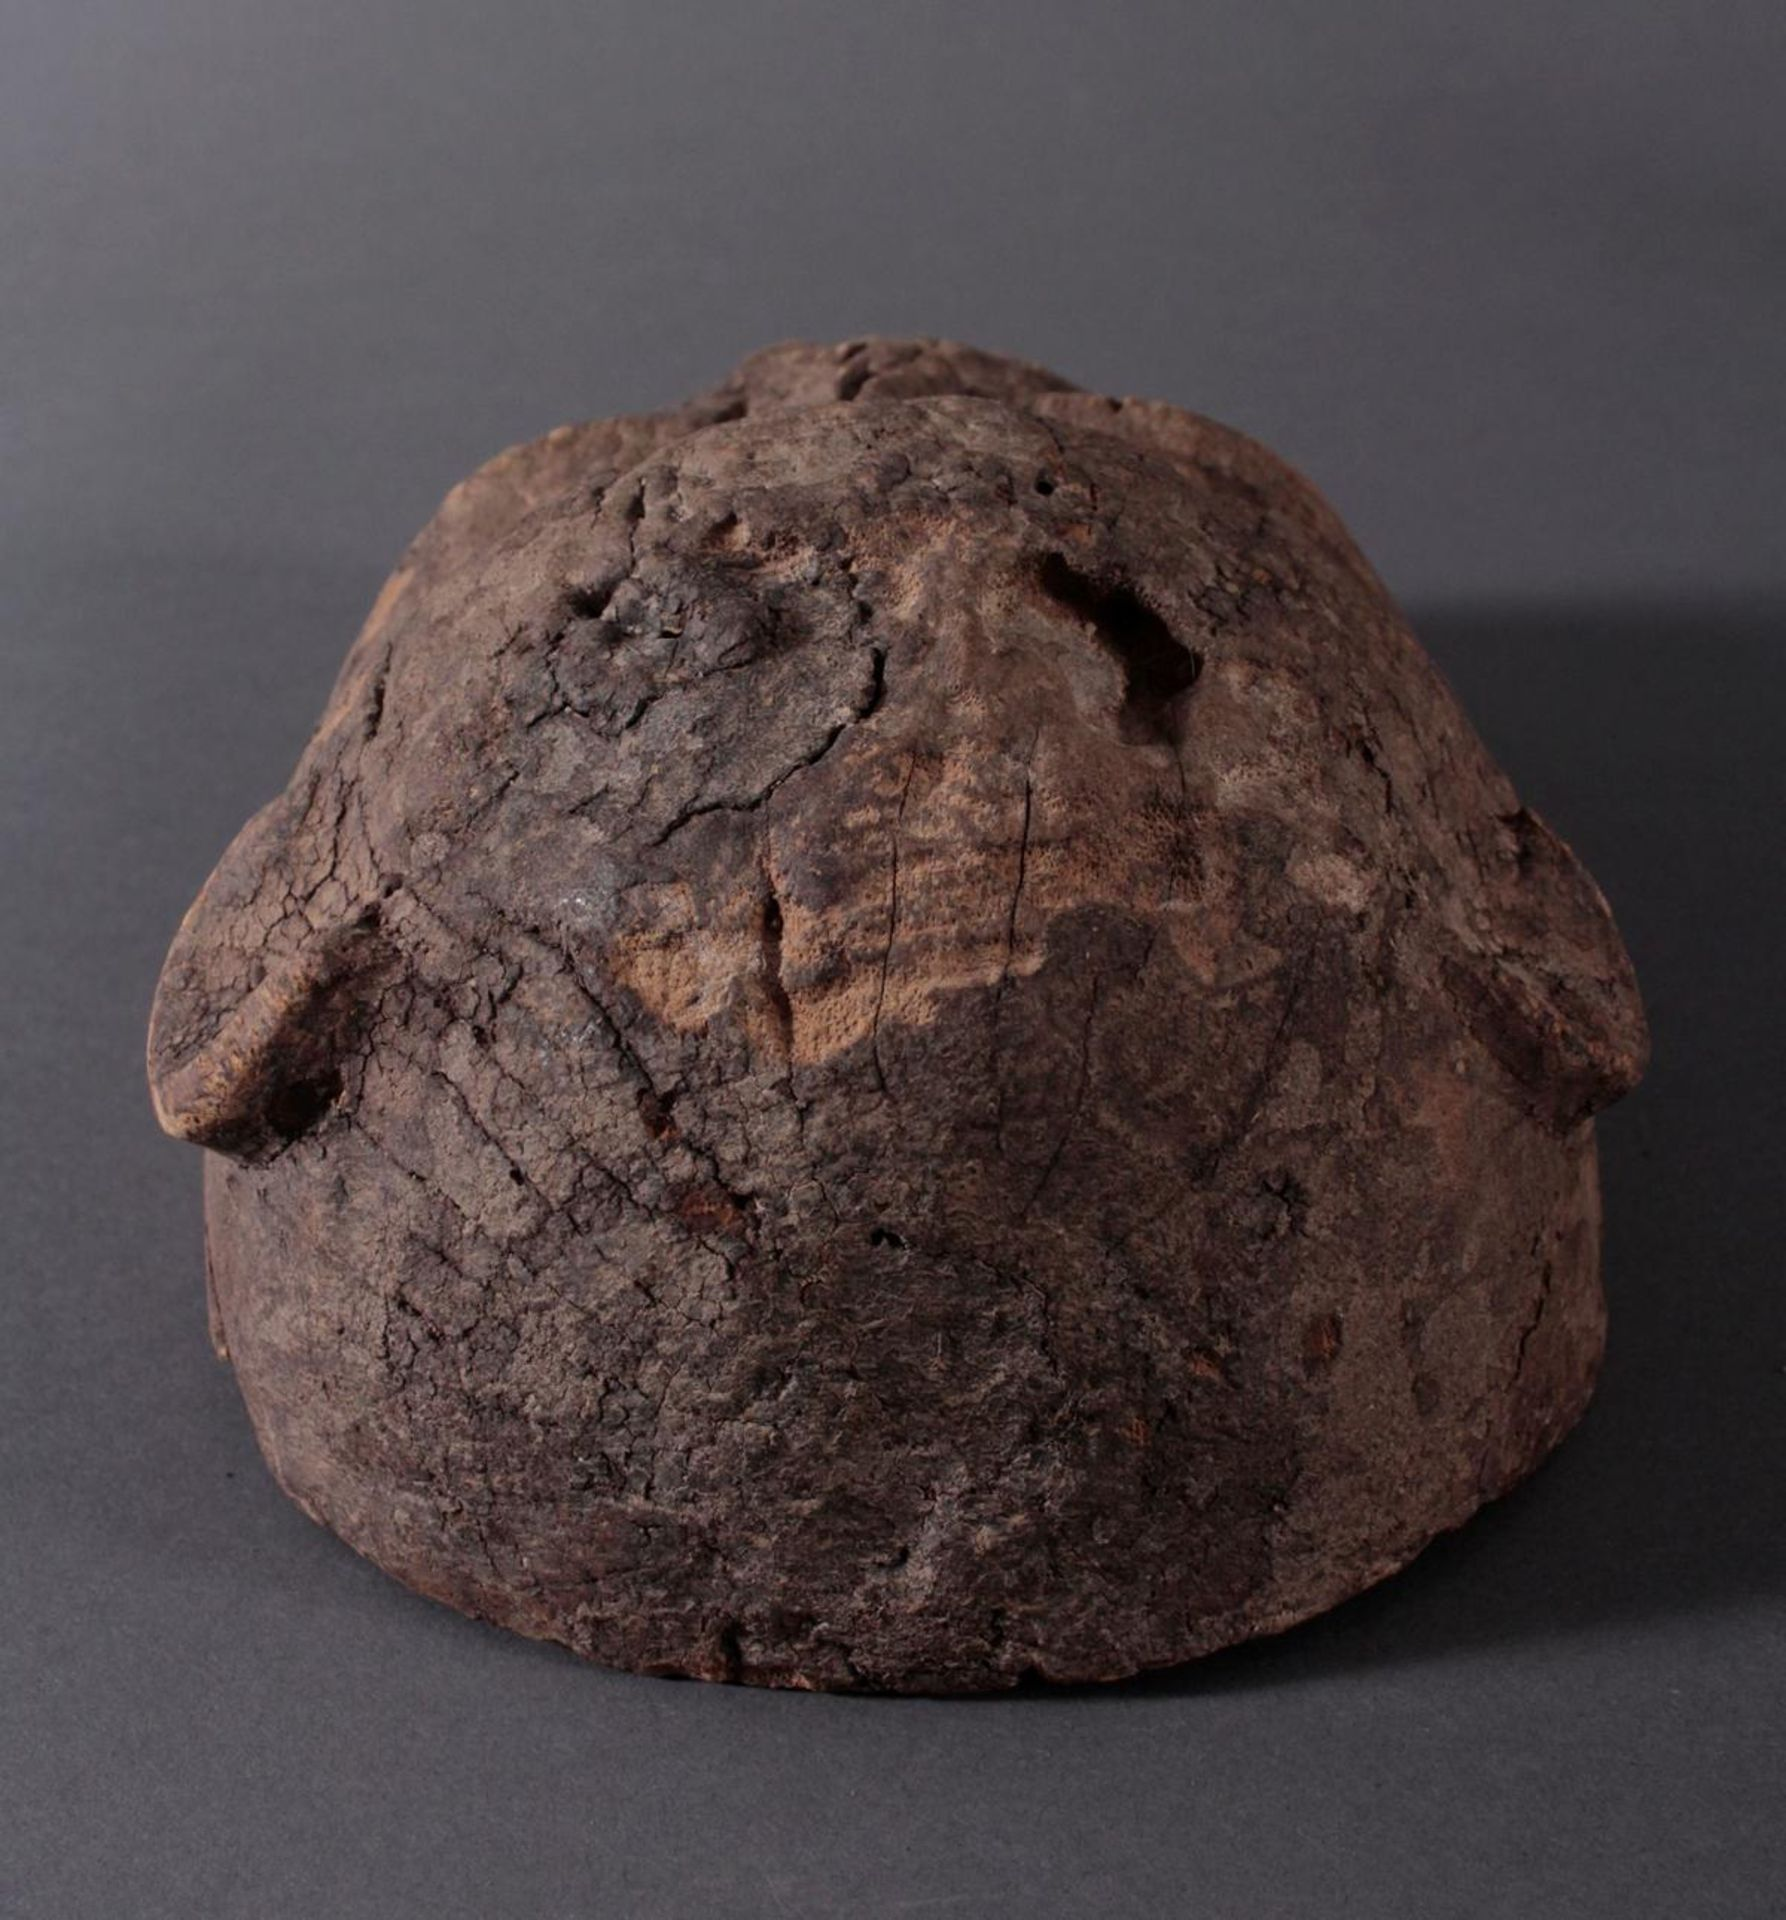 Antike Zoomorphe Maske, Makua, Tansania 1. Hälfte 20. Jh.Hartholzolz, alter Wurmfrass, dunkle Patina - Bild 5 aus 6